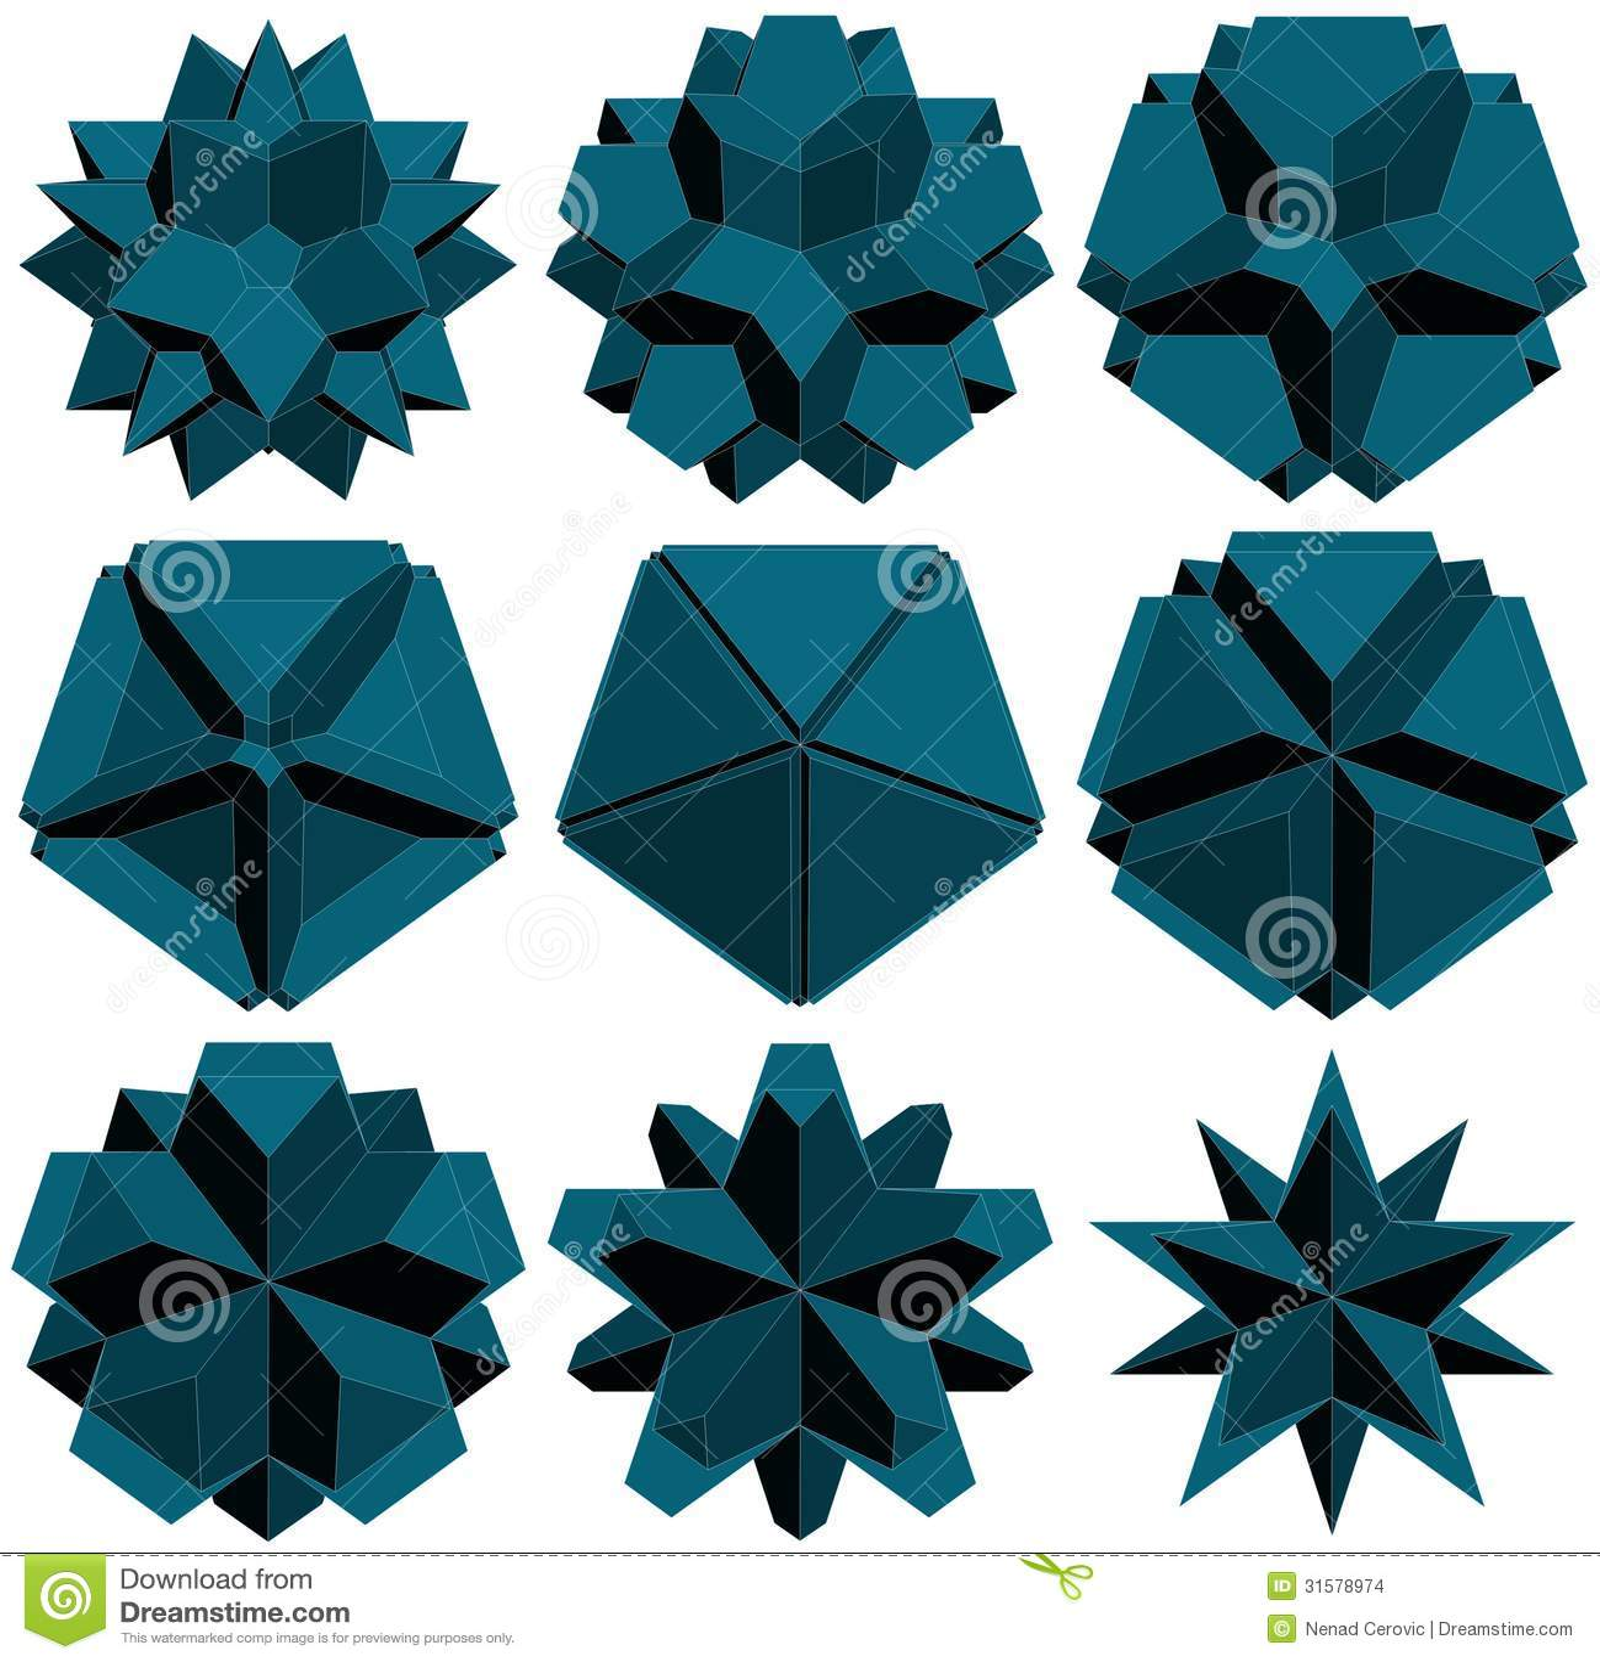 image 1 mot solution wYEh